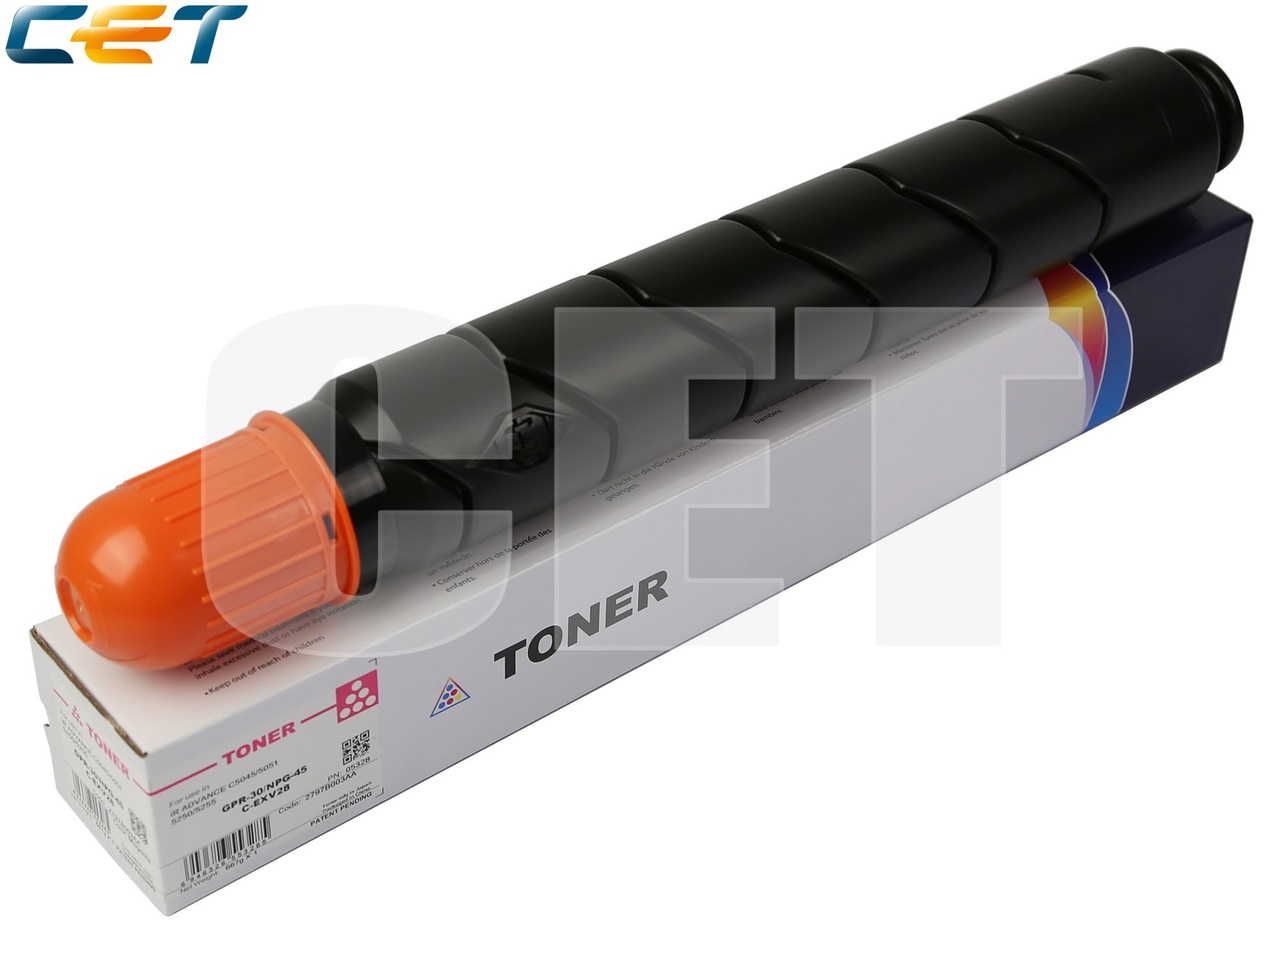 Тонер-картридж (CPP) C-EXV28 для CANON iR ADVANCEC5045/C5051/C5250/C5255 (CET) Magenta, 667г, 38000 стр.,CET5328